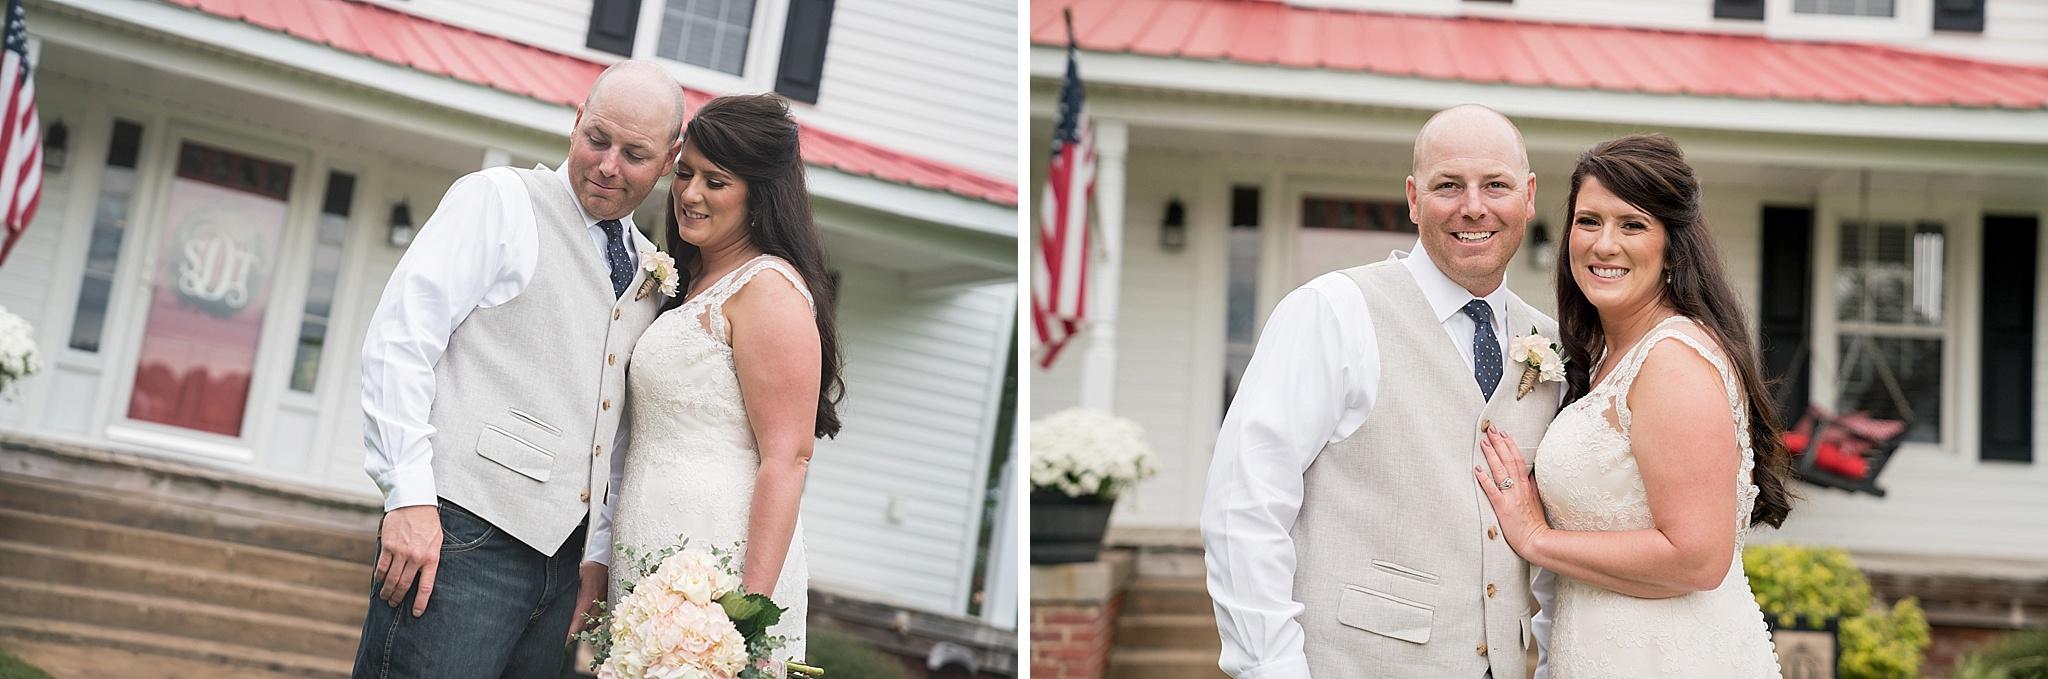 Tarboro-NC-Wedding-Photographer-026.jpg